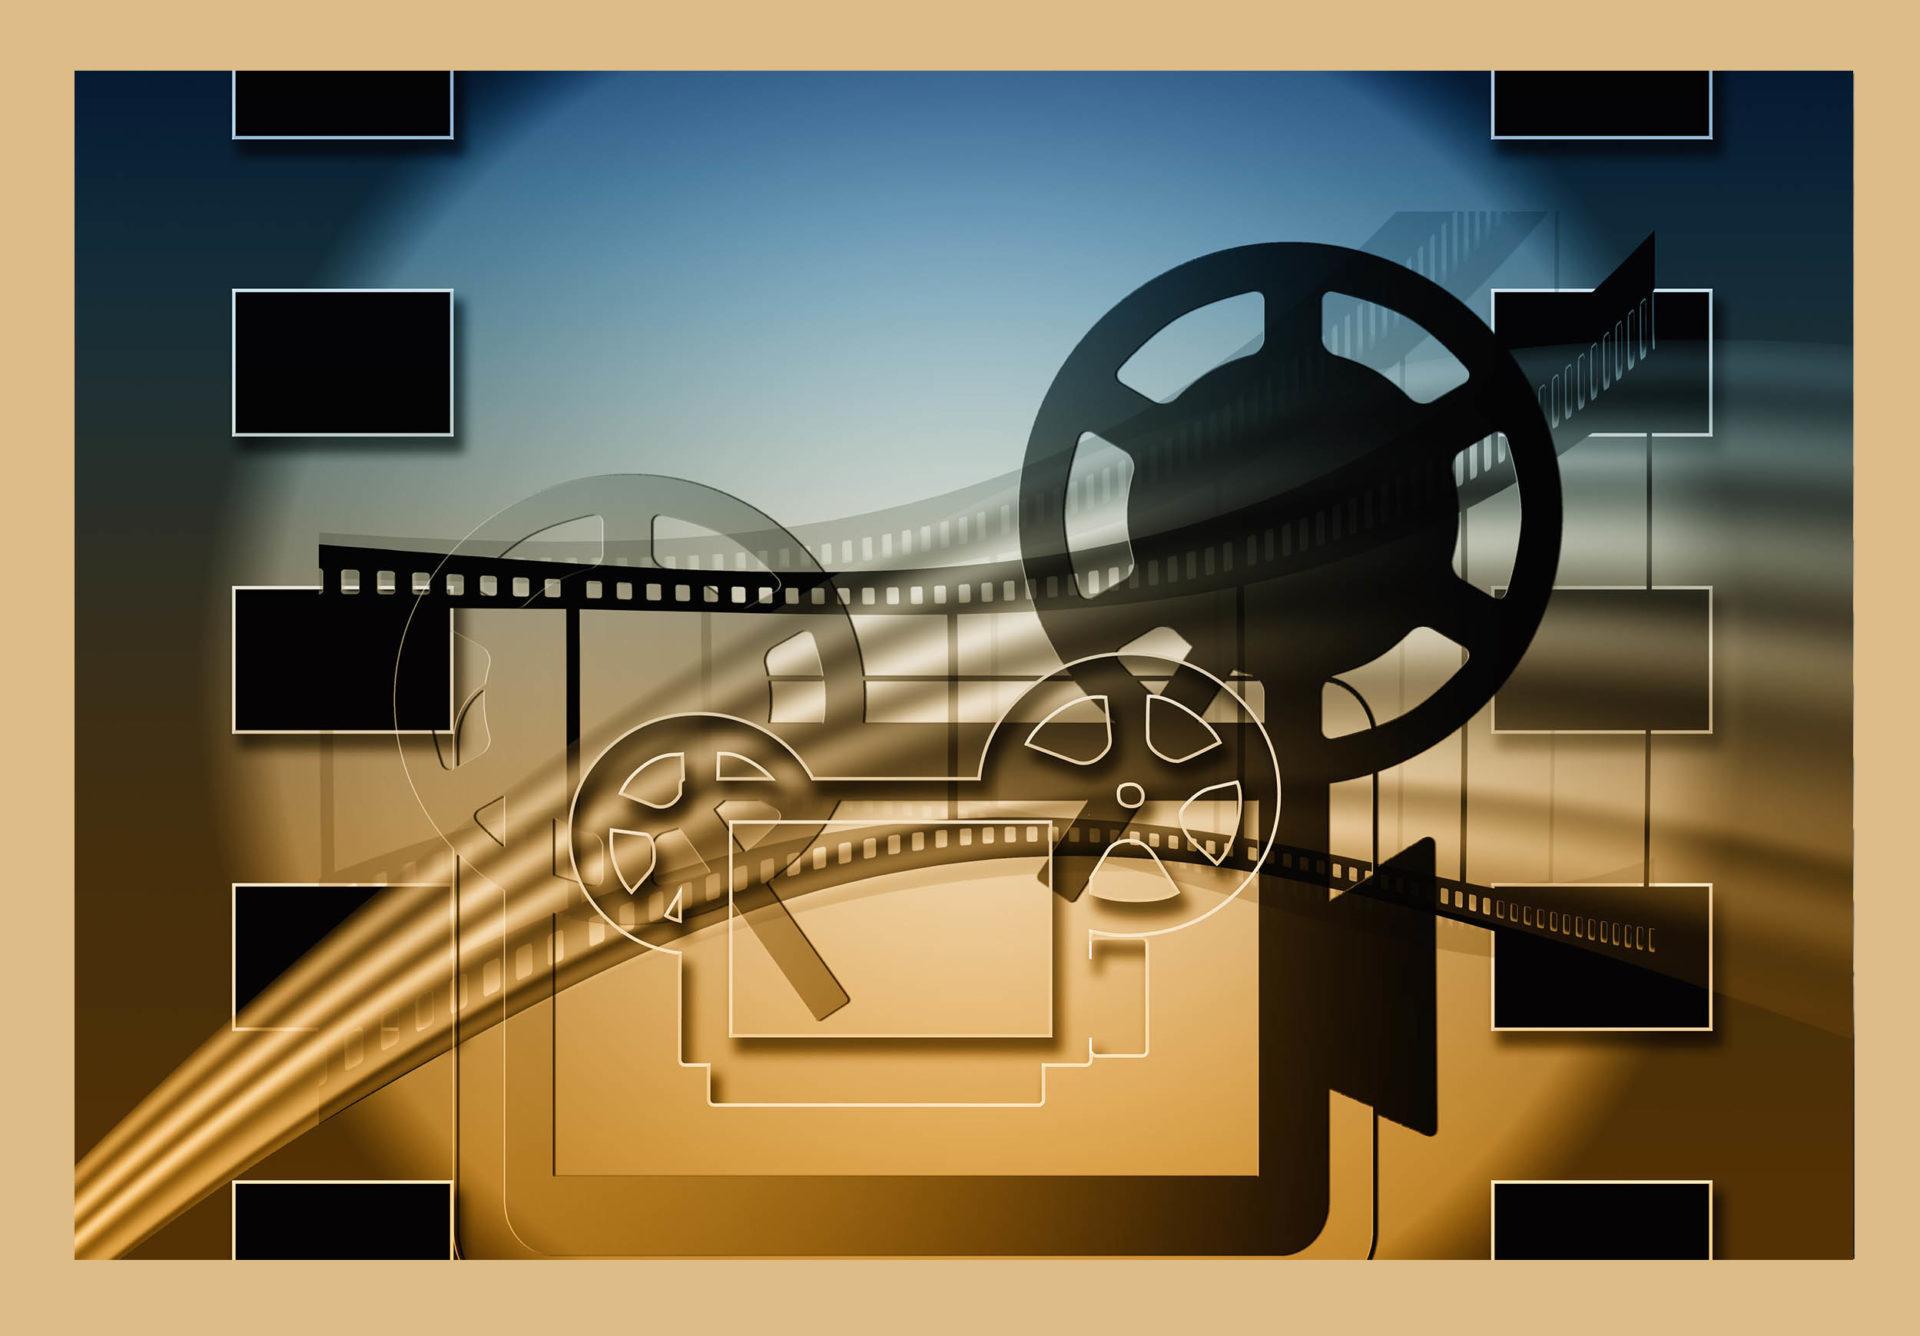 Beyond Yonder Films 4 - James Martinez - Aswan Creations